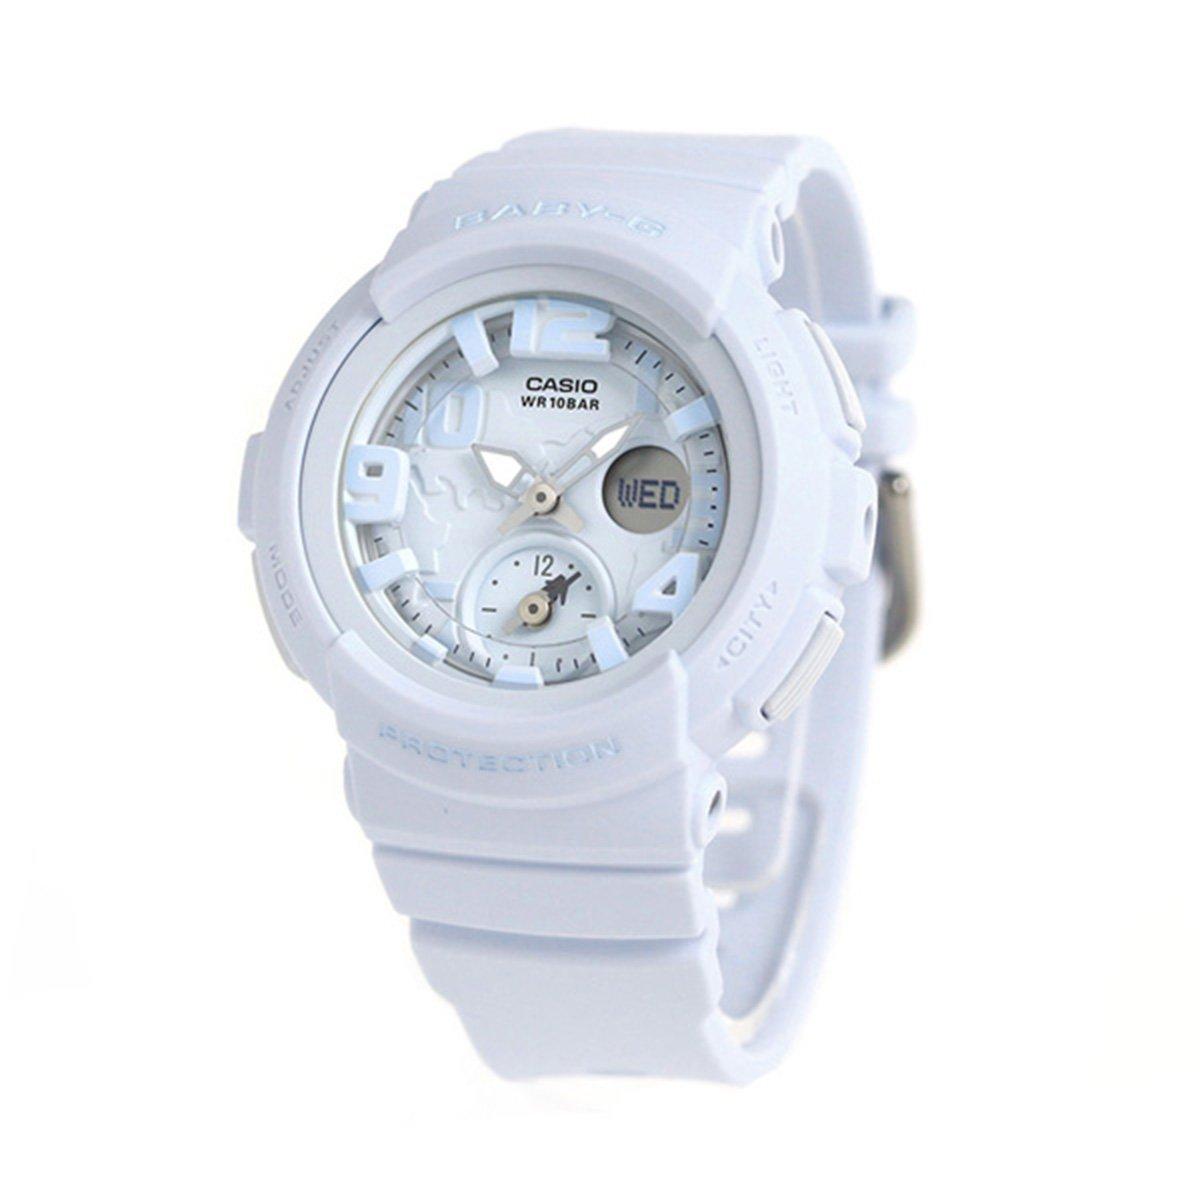 Casio G Shock Bga190bc 2b Watches Ltp 1378l 2e Women Quartz Watch Blue